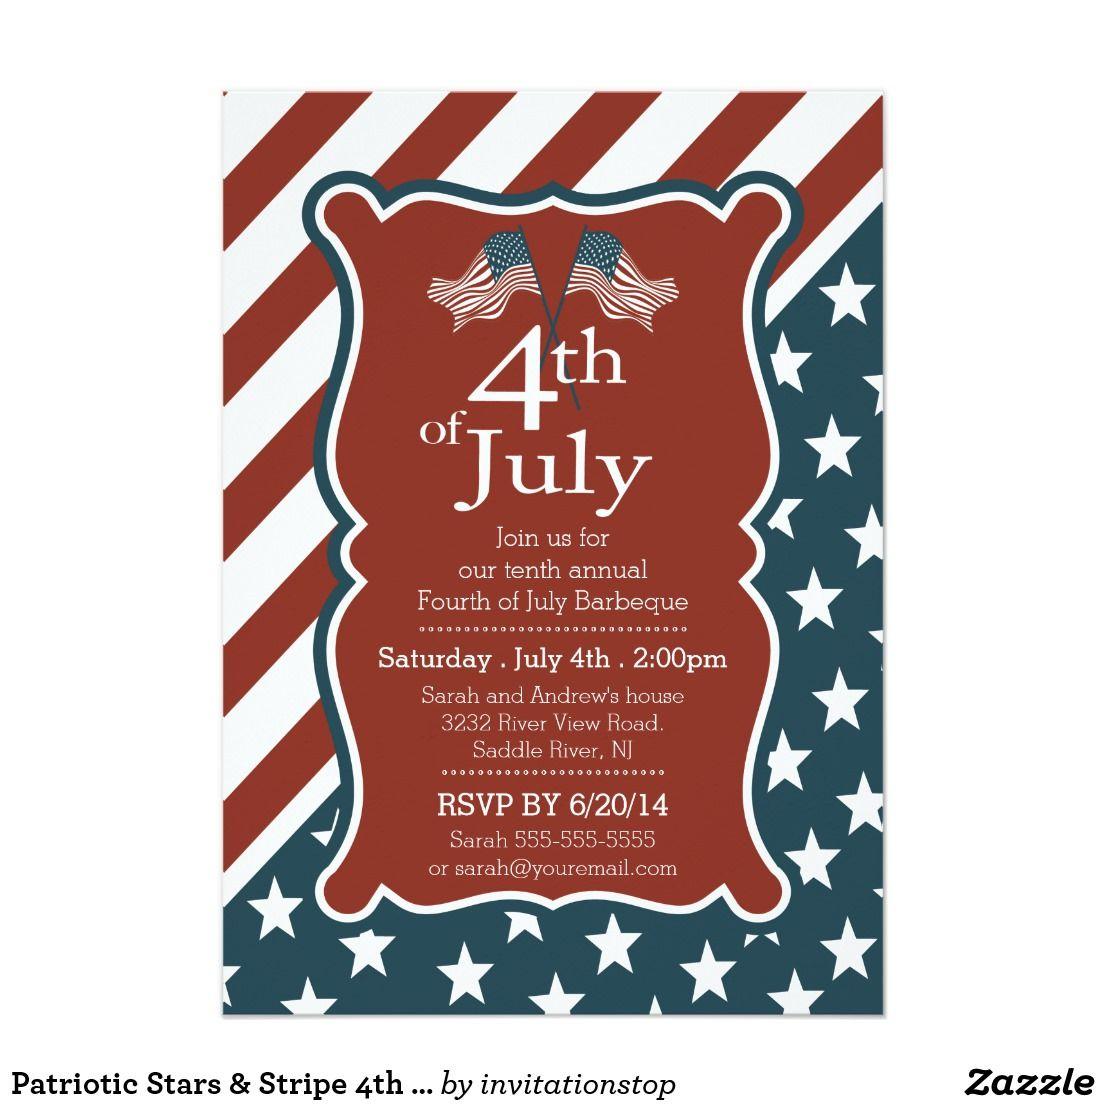 Patriotic Stars & Stripe 4th of July Party Invitation   Pinterest ...